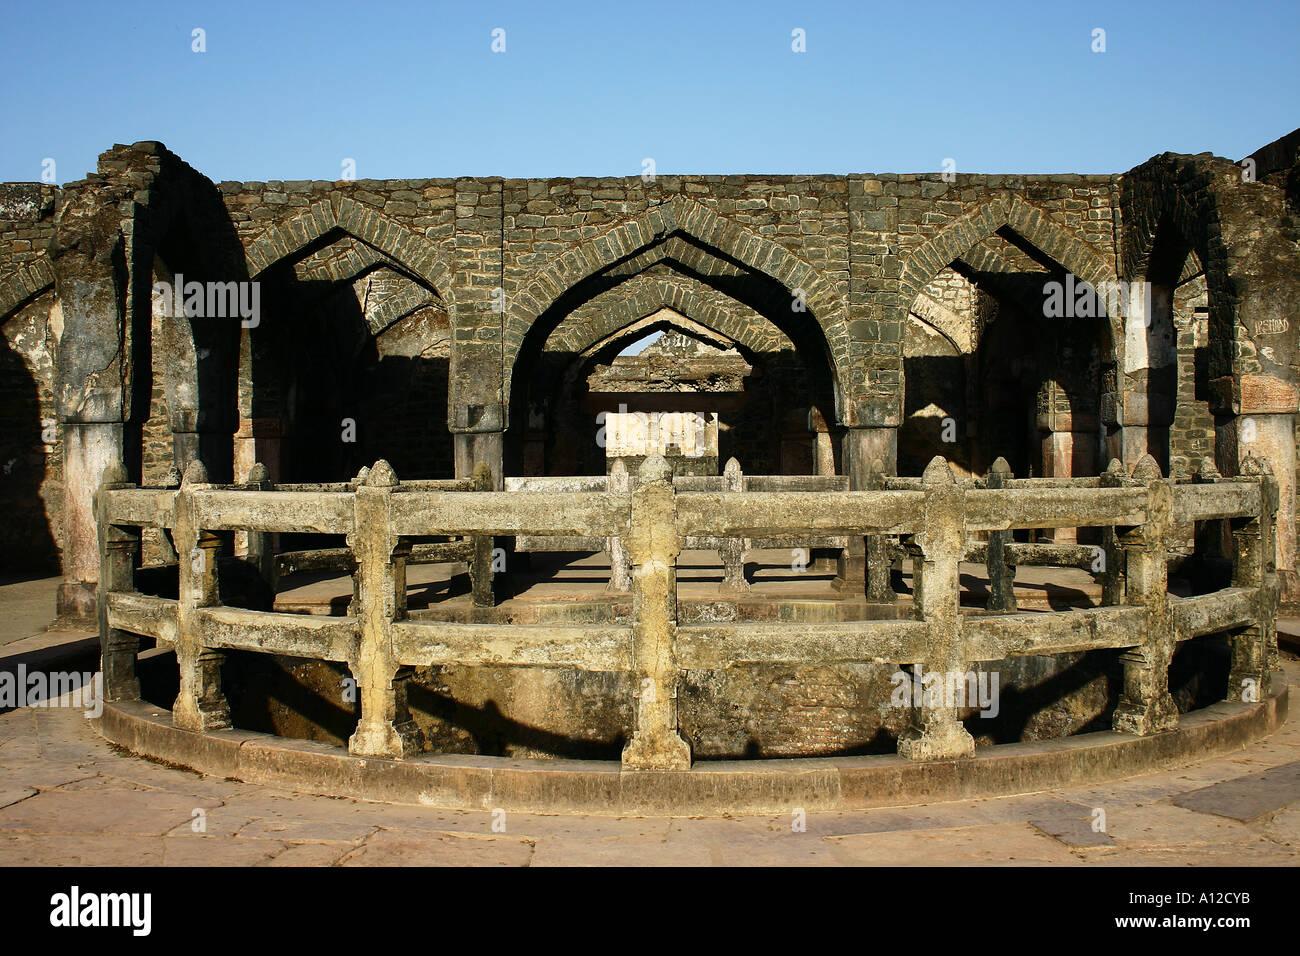 RSC75089 Champa Baodi 1500 AD Mandu Madhya Pradesh India - Stock Image